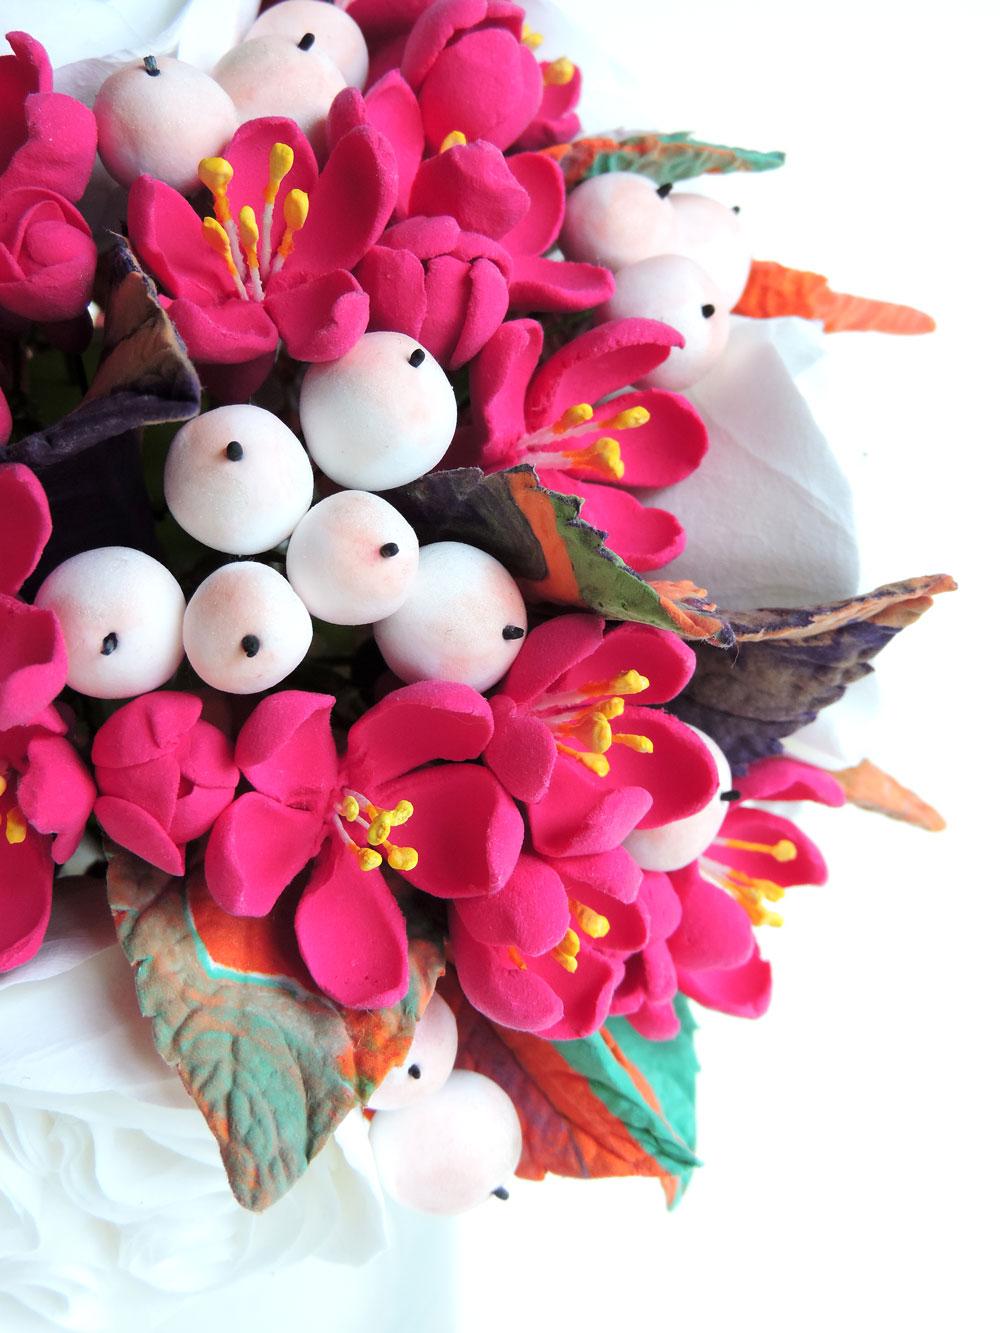 vibrant crabapple blossoms